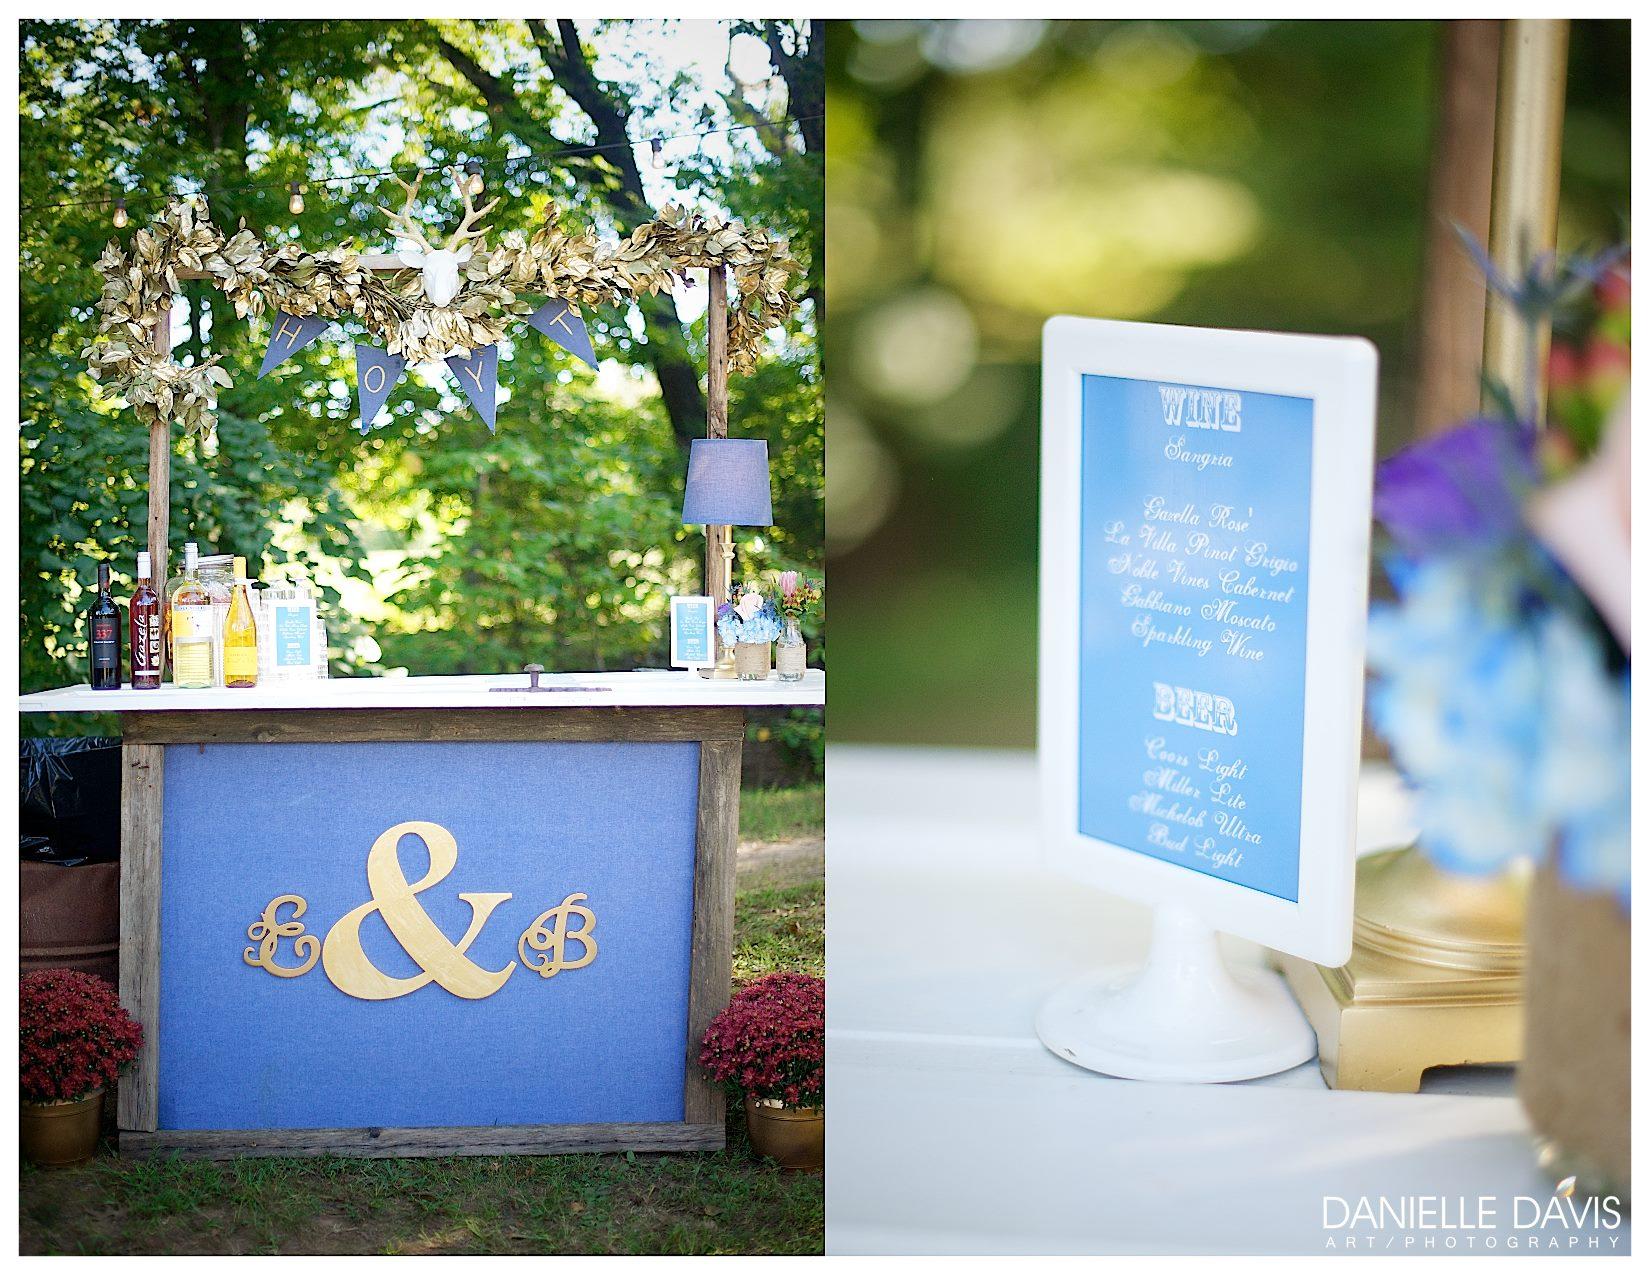 Danielle Davis Art/Photography  , from  Emily + Blake  's wedding at The Barn